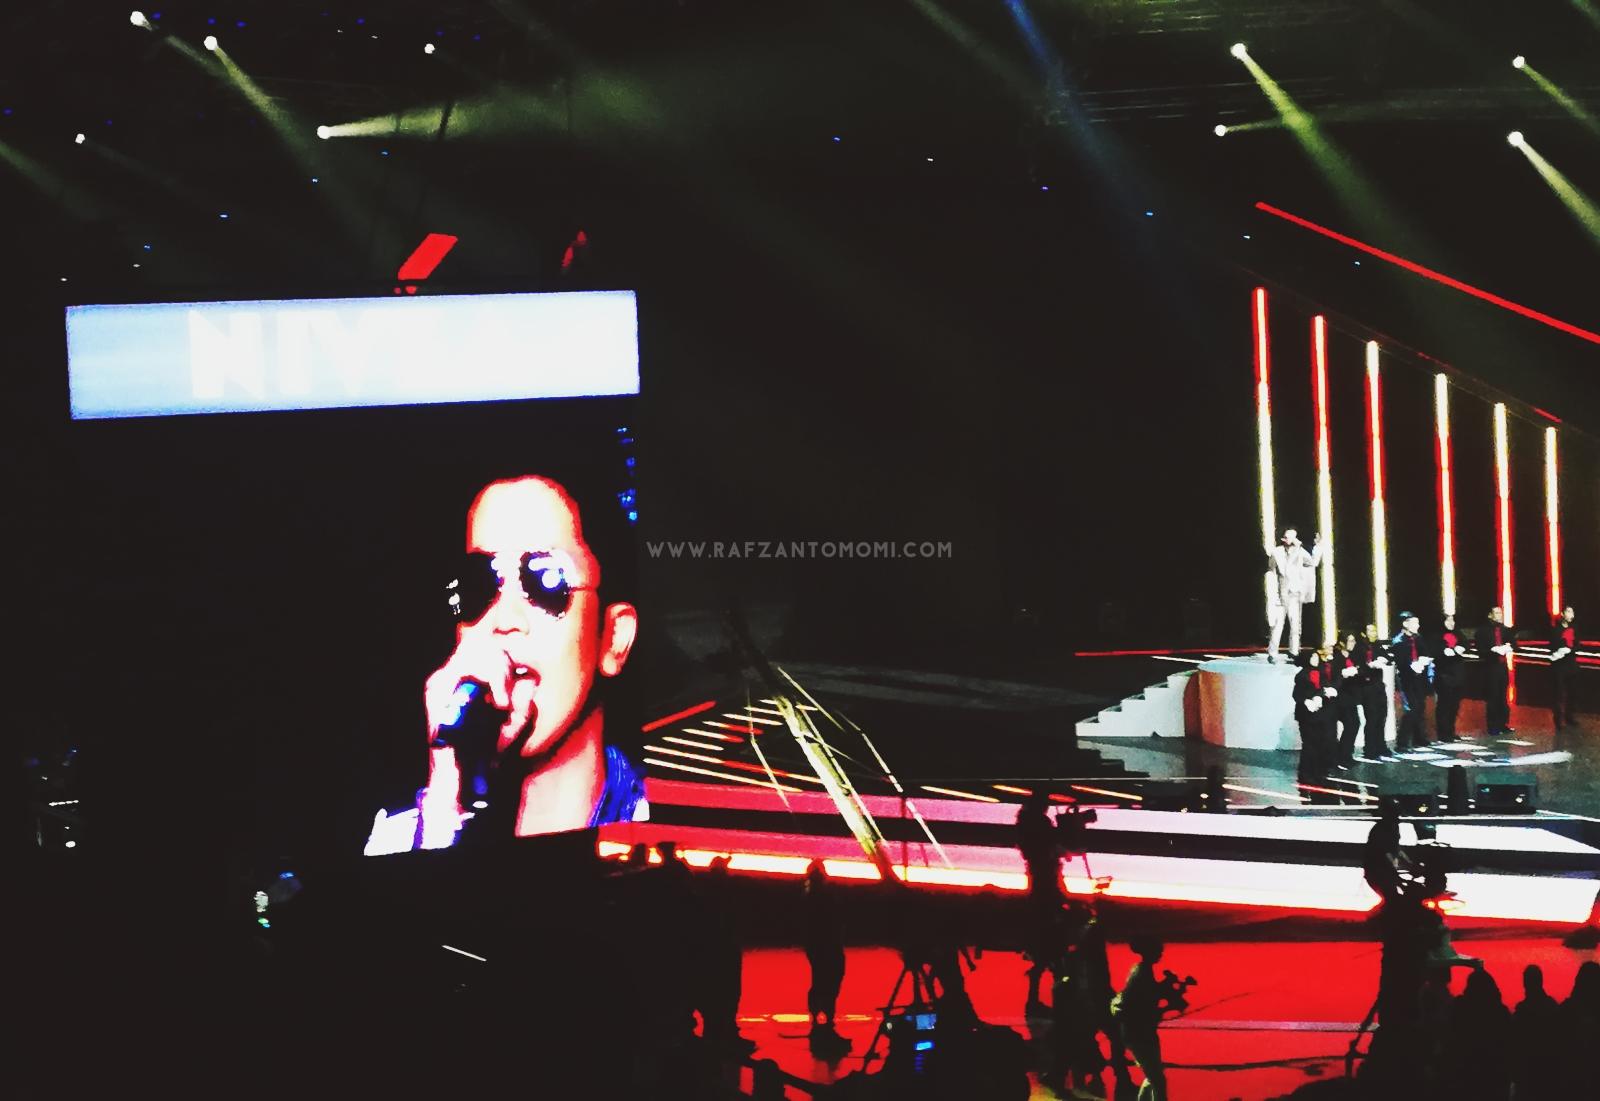 Pengalaman Ke Anugerah Juara Lagu 32 Di Axiata Arena, Bukit Jalil